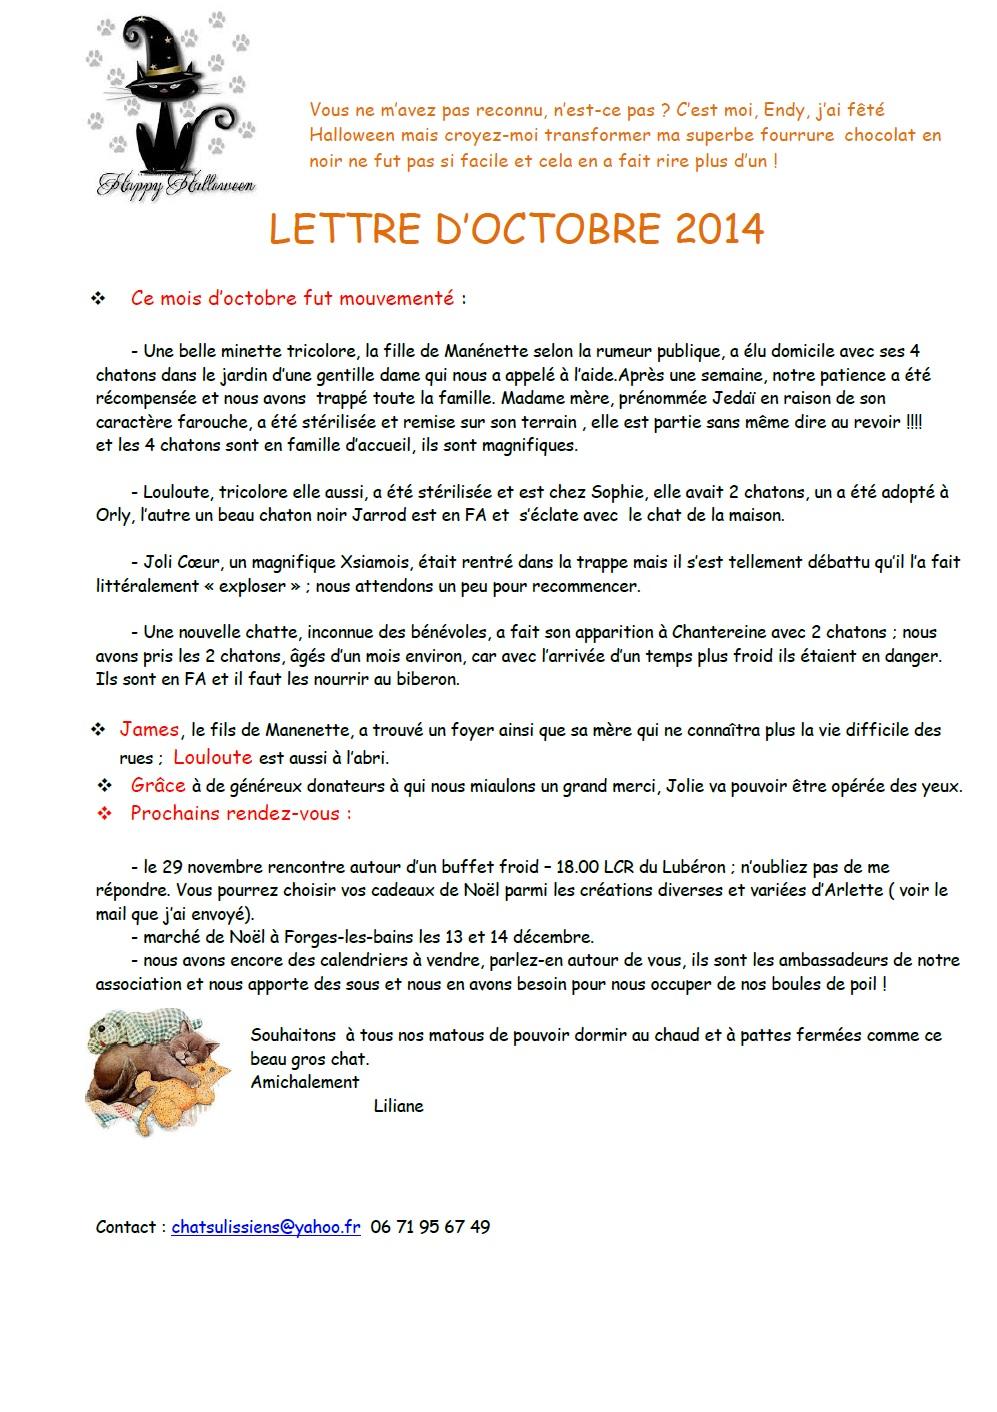 lettre octobre 2014